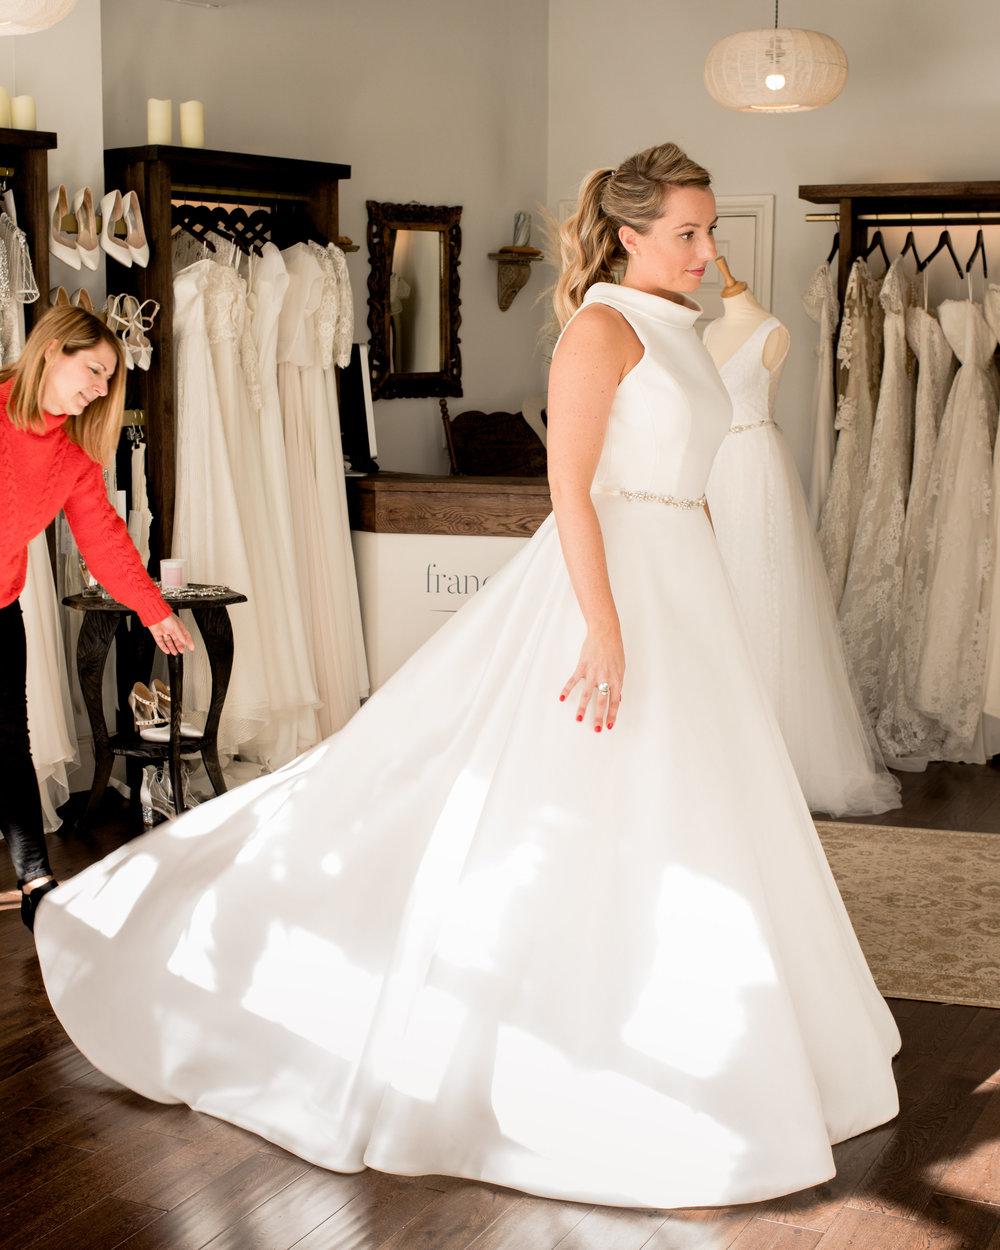 Dress: 'Swanson by  Suzanne Neville